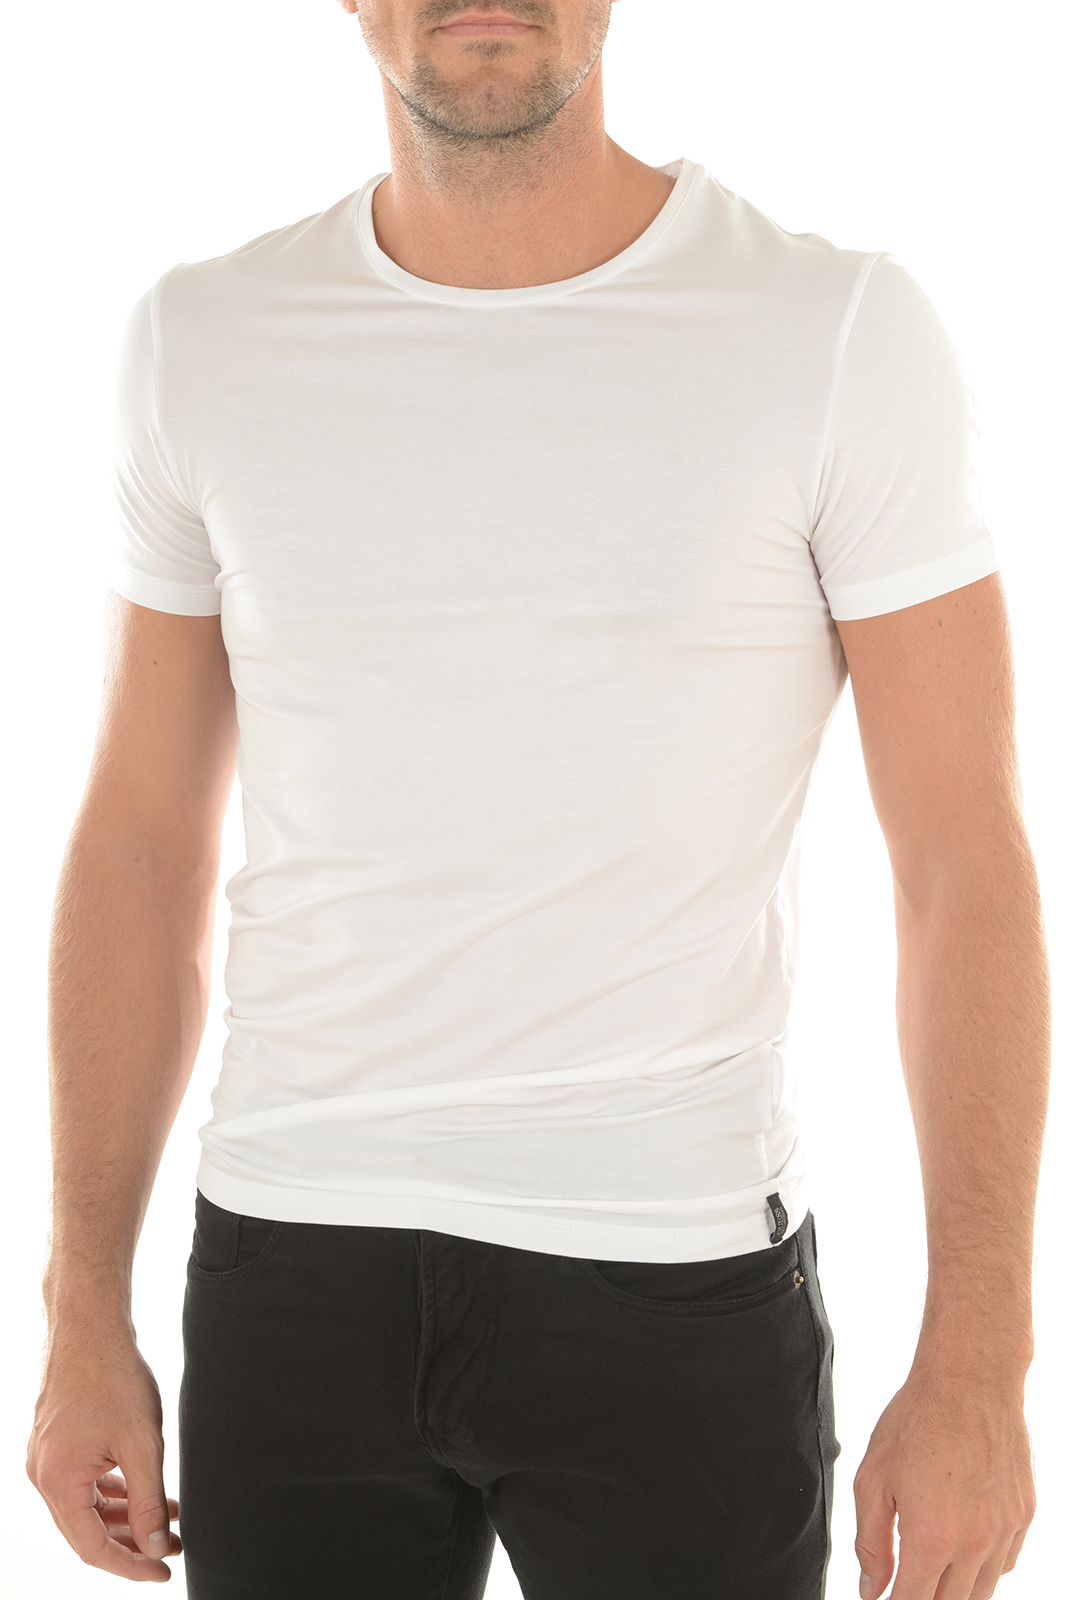 Tee-shirts  Guess jeans U64M22LYO11 A009 BLANC